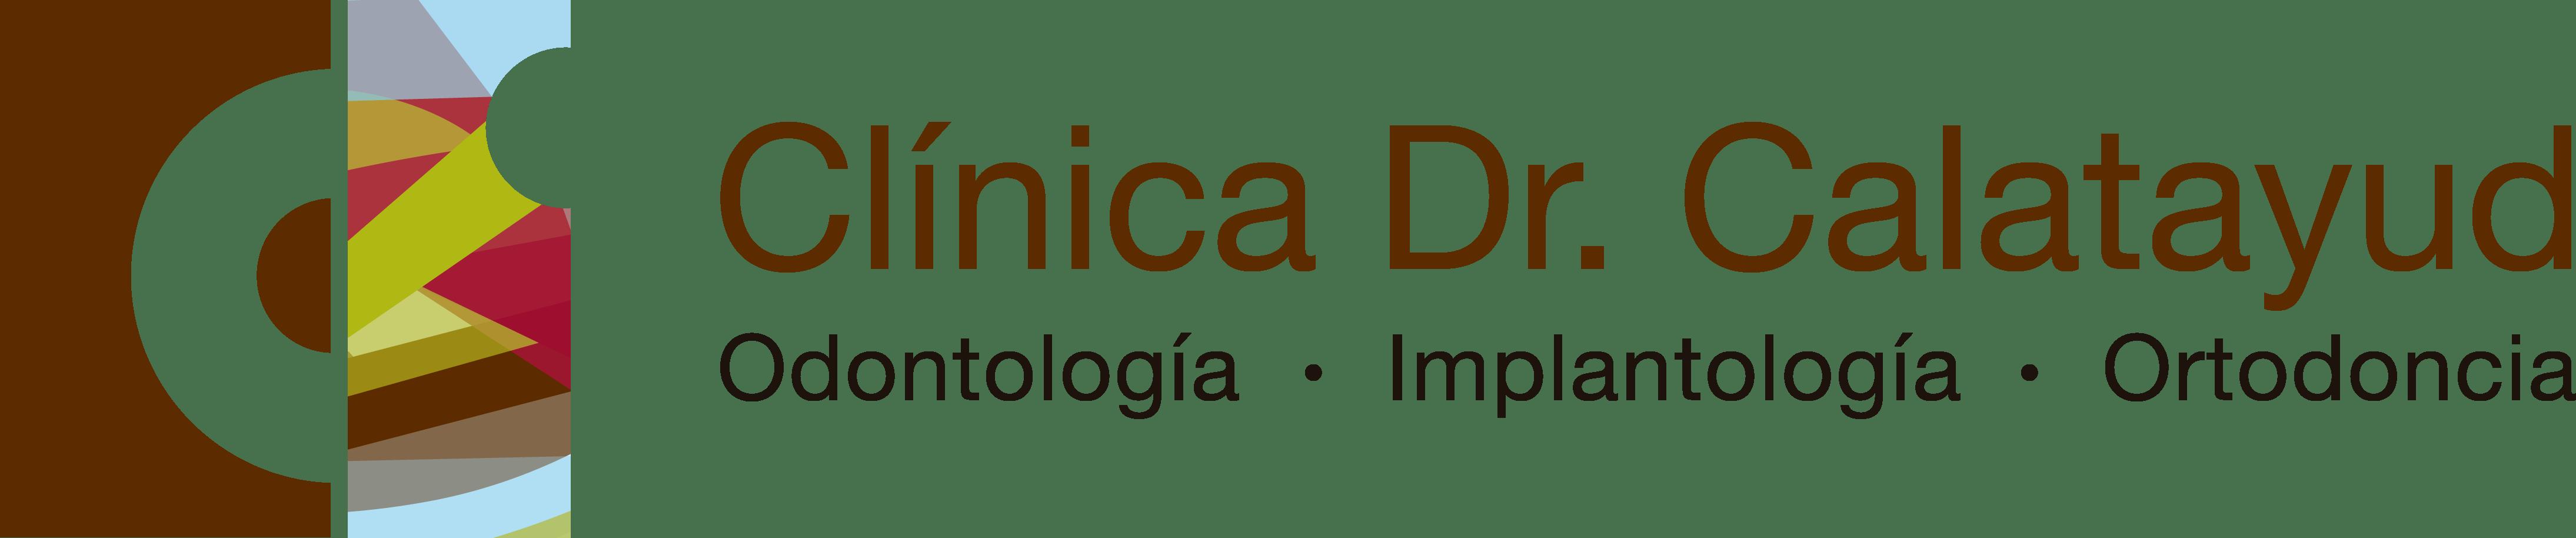 Clinica Dr. Calatayud